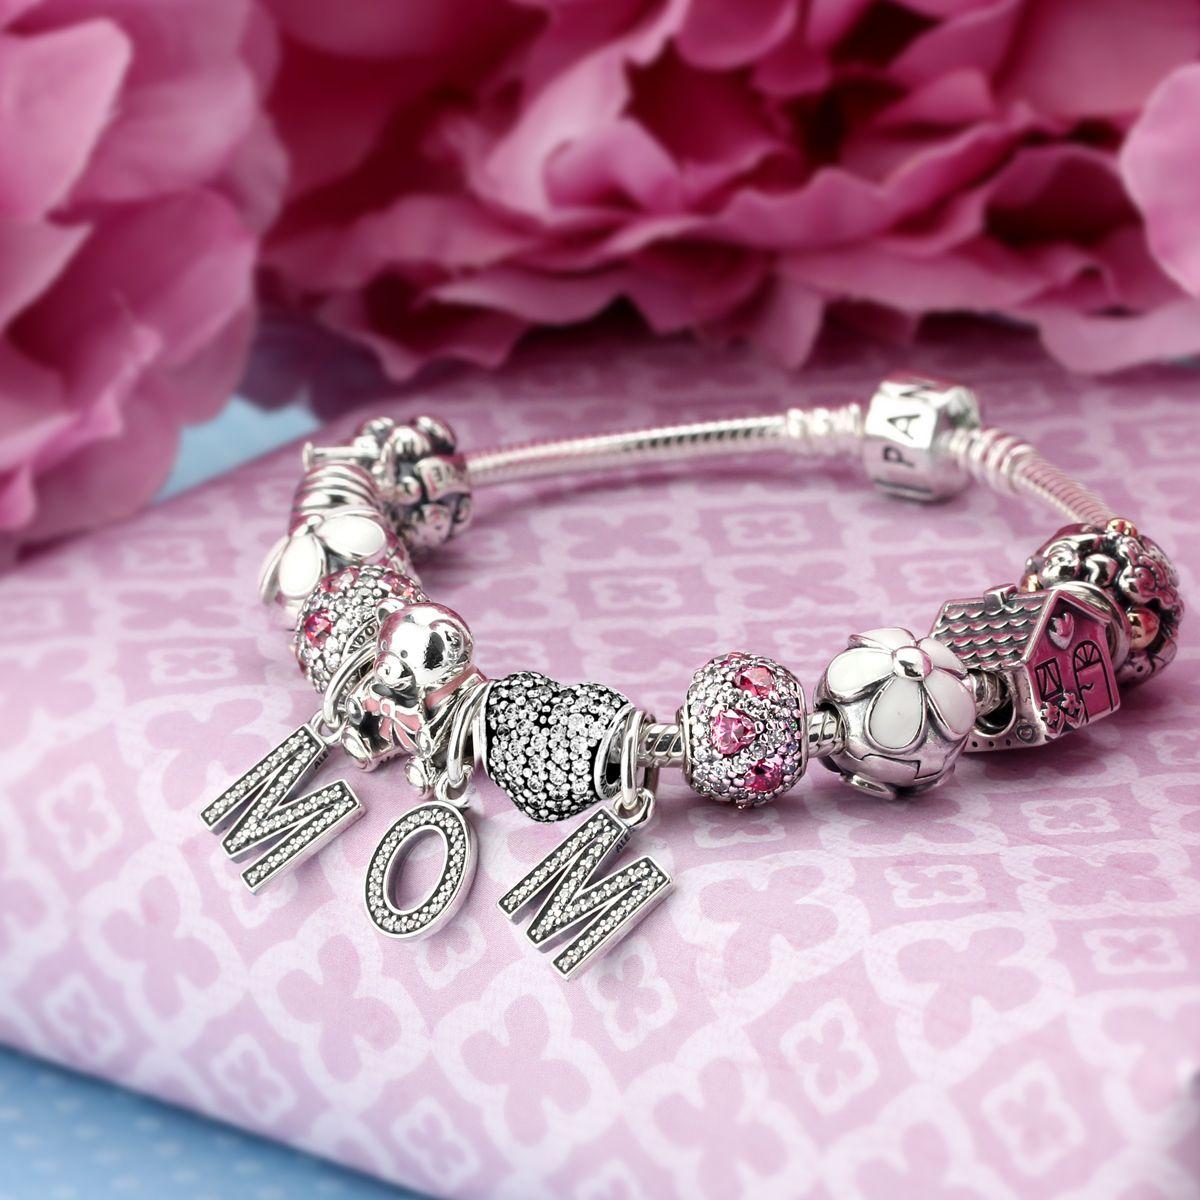 Charms For Bracelets Pandora